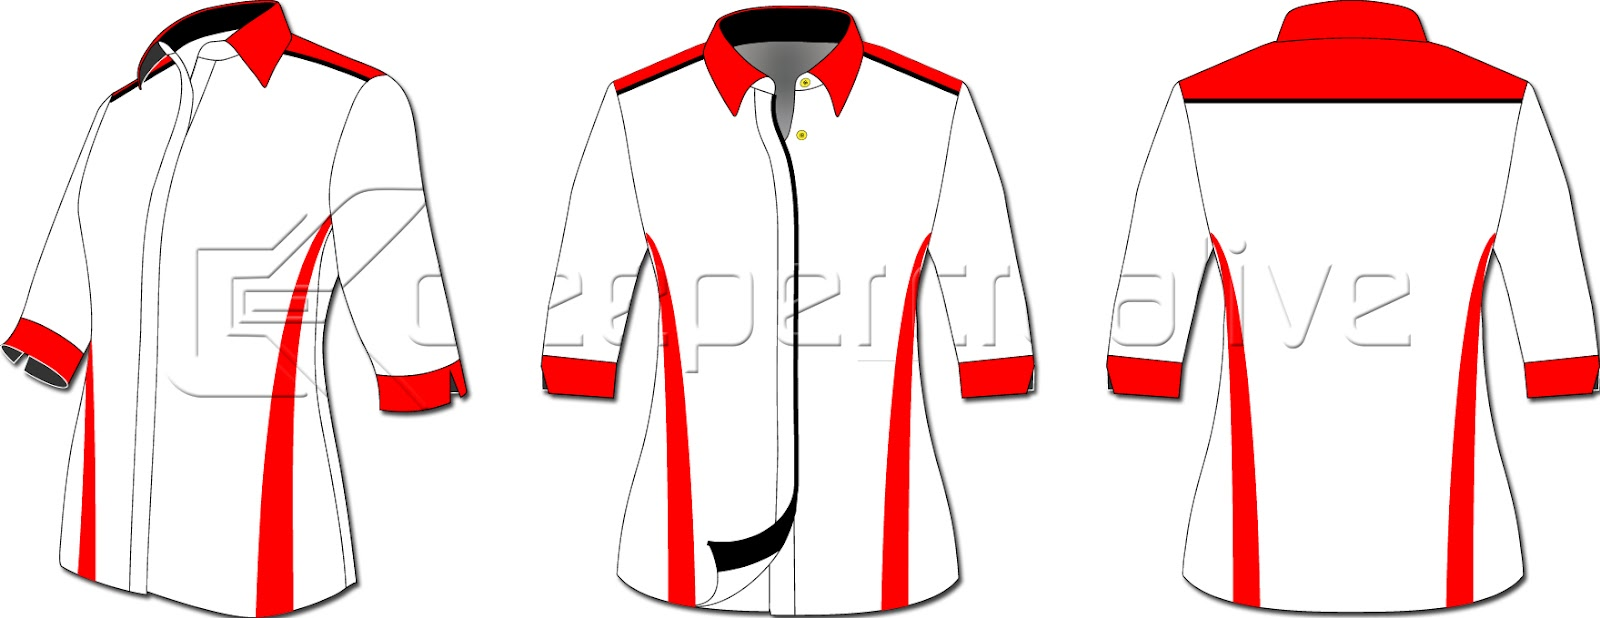 Cs 0317 Shirt Design Creeper Design